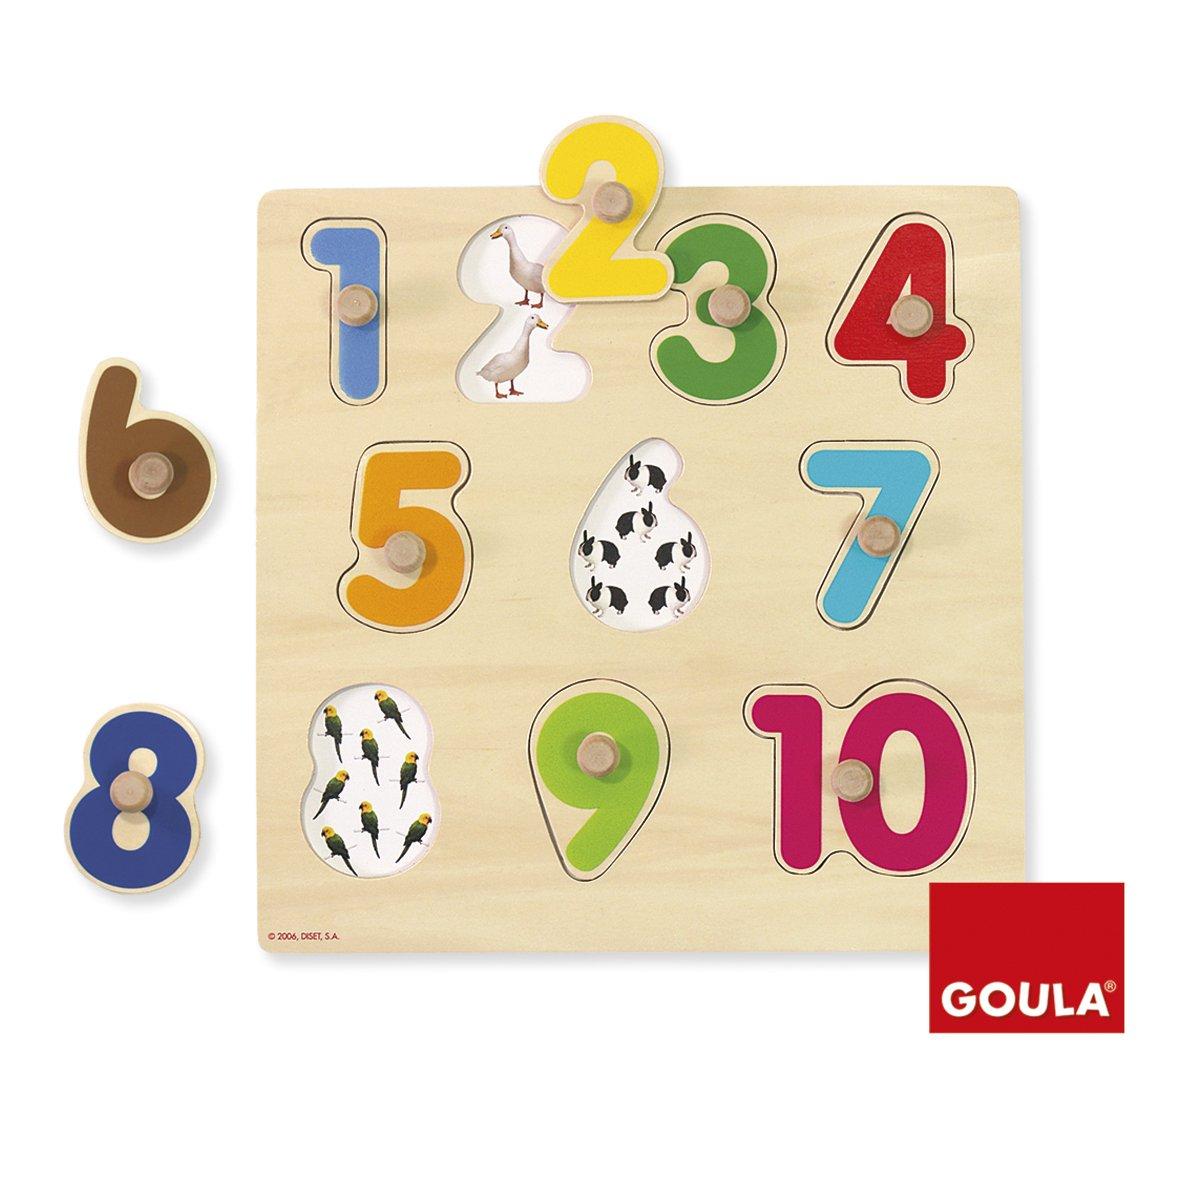 Goula Numbers Puzzle Encajes Madera números Goula28x28 Diset 53074 product image